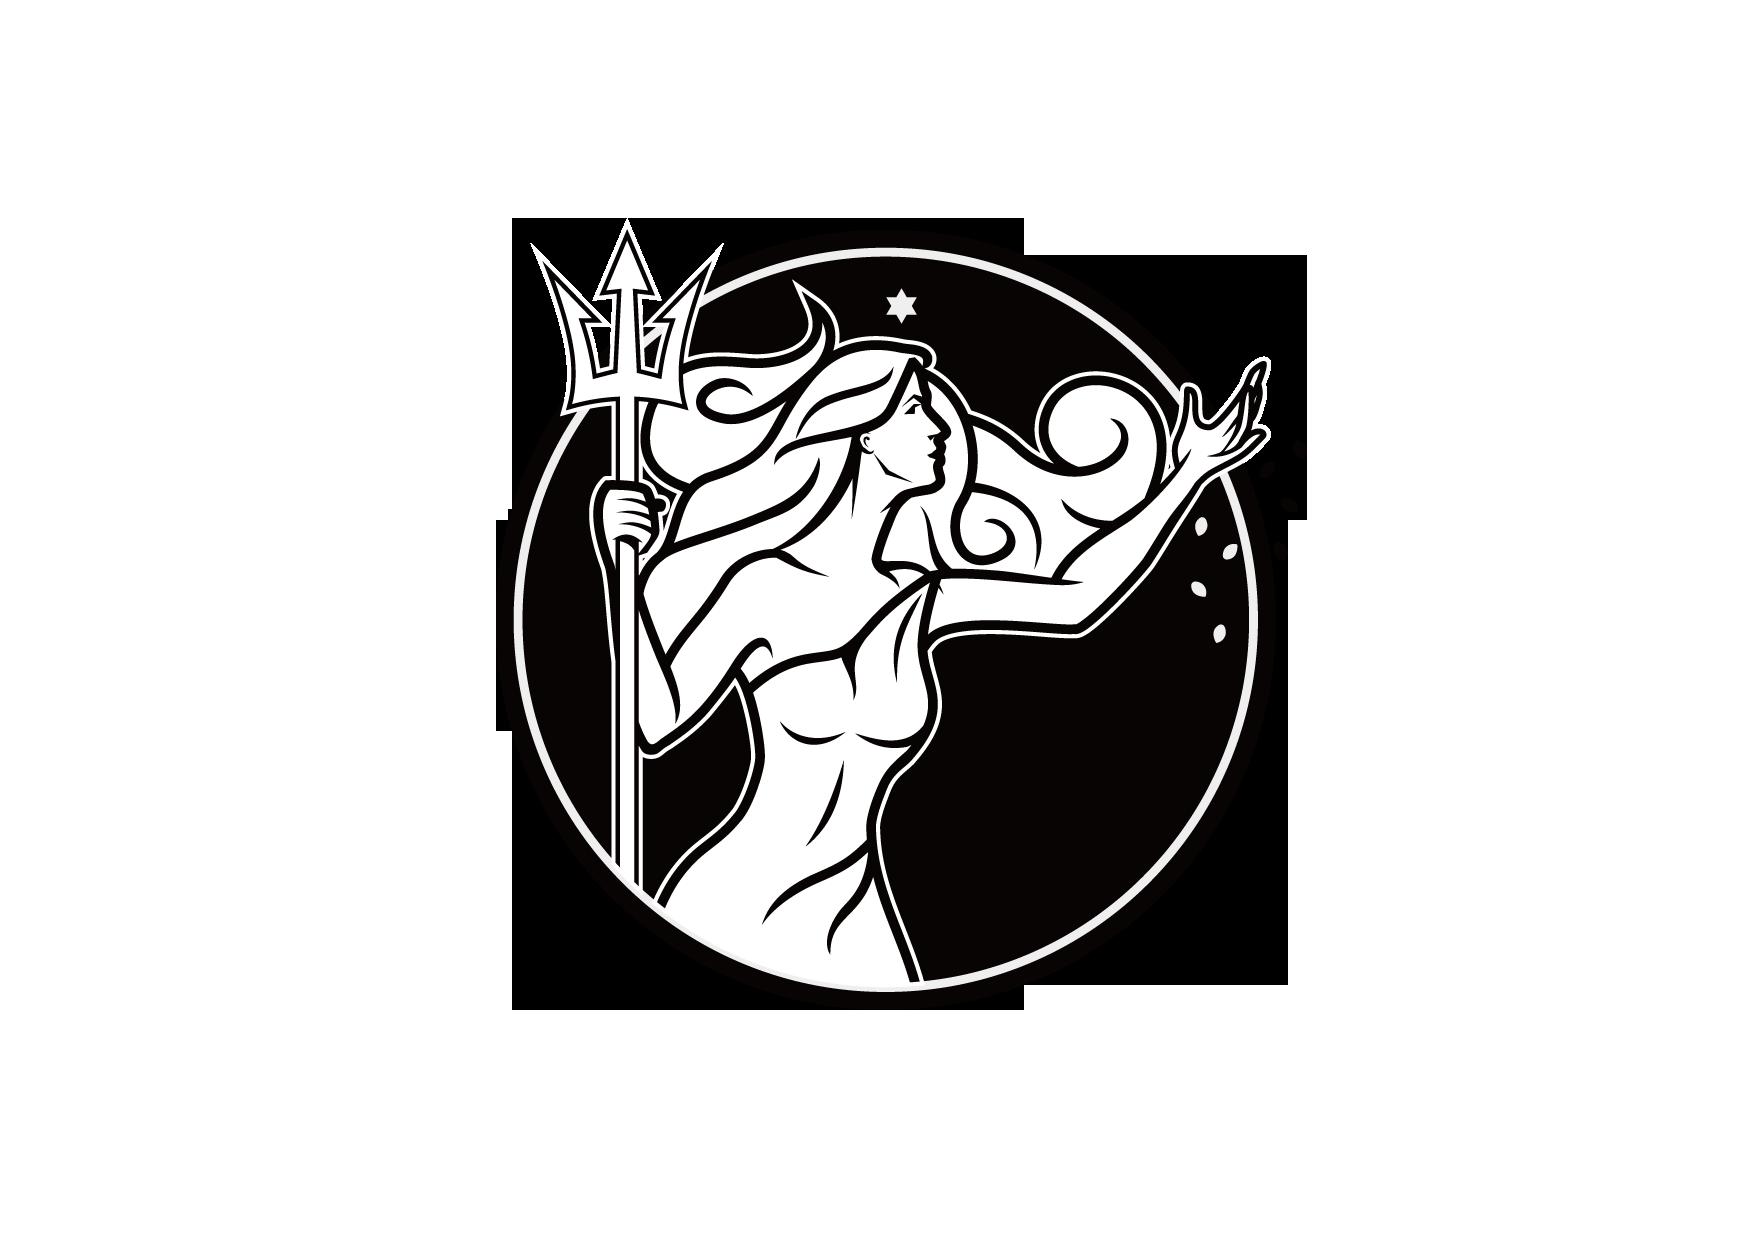 Organic farm logo of a female goddess planting seeds